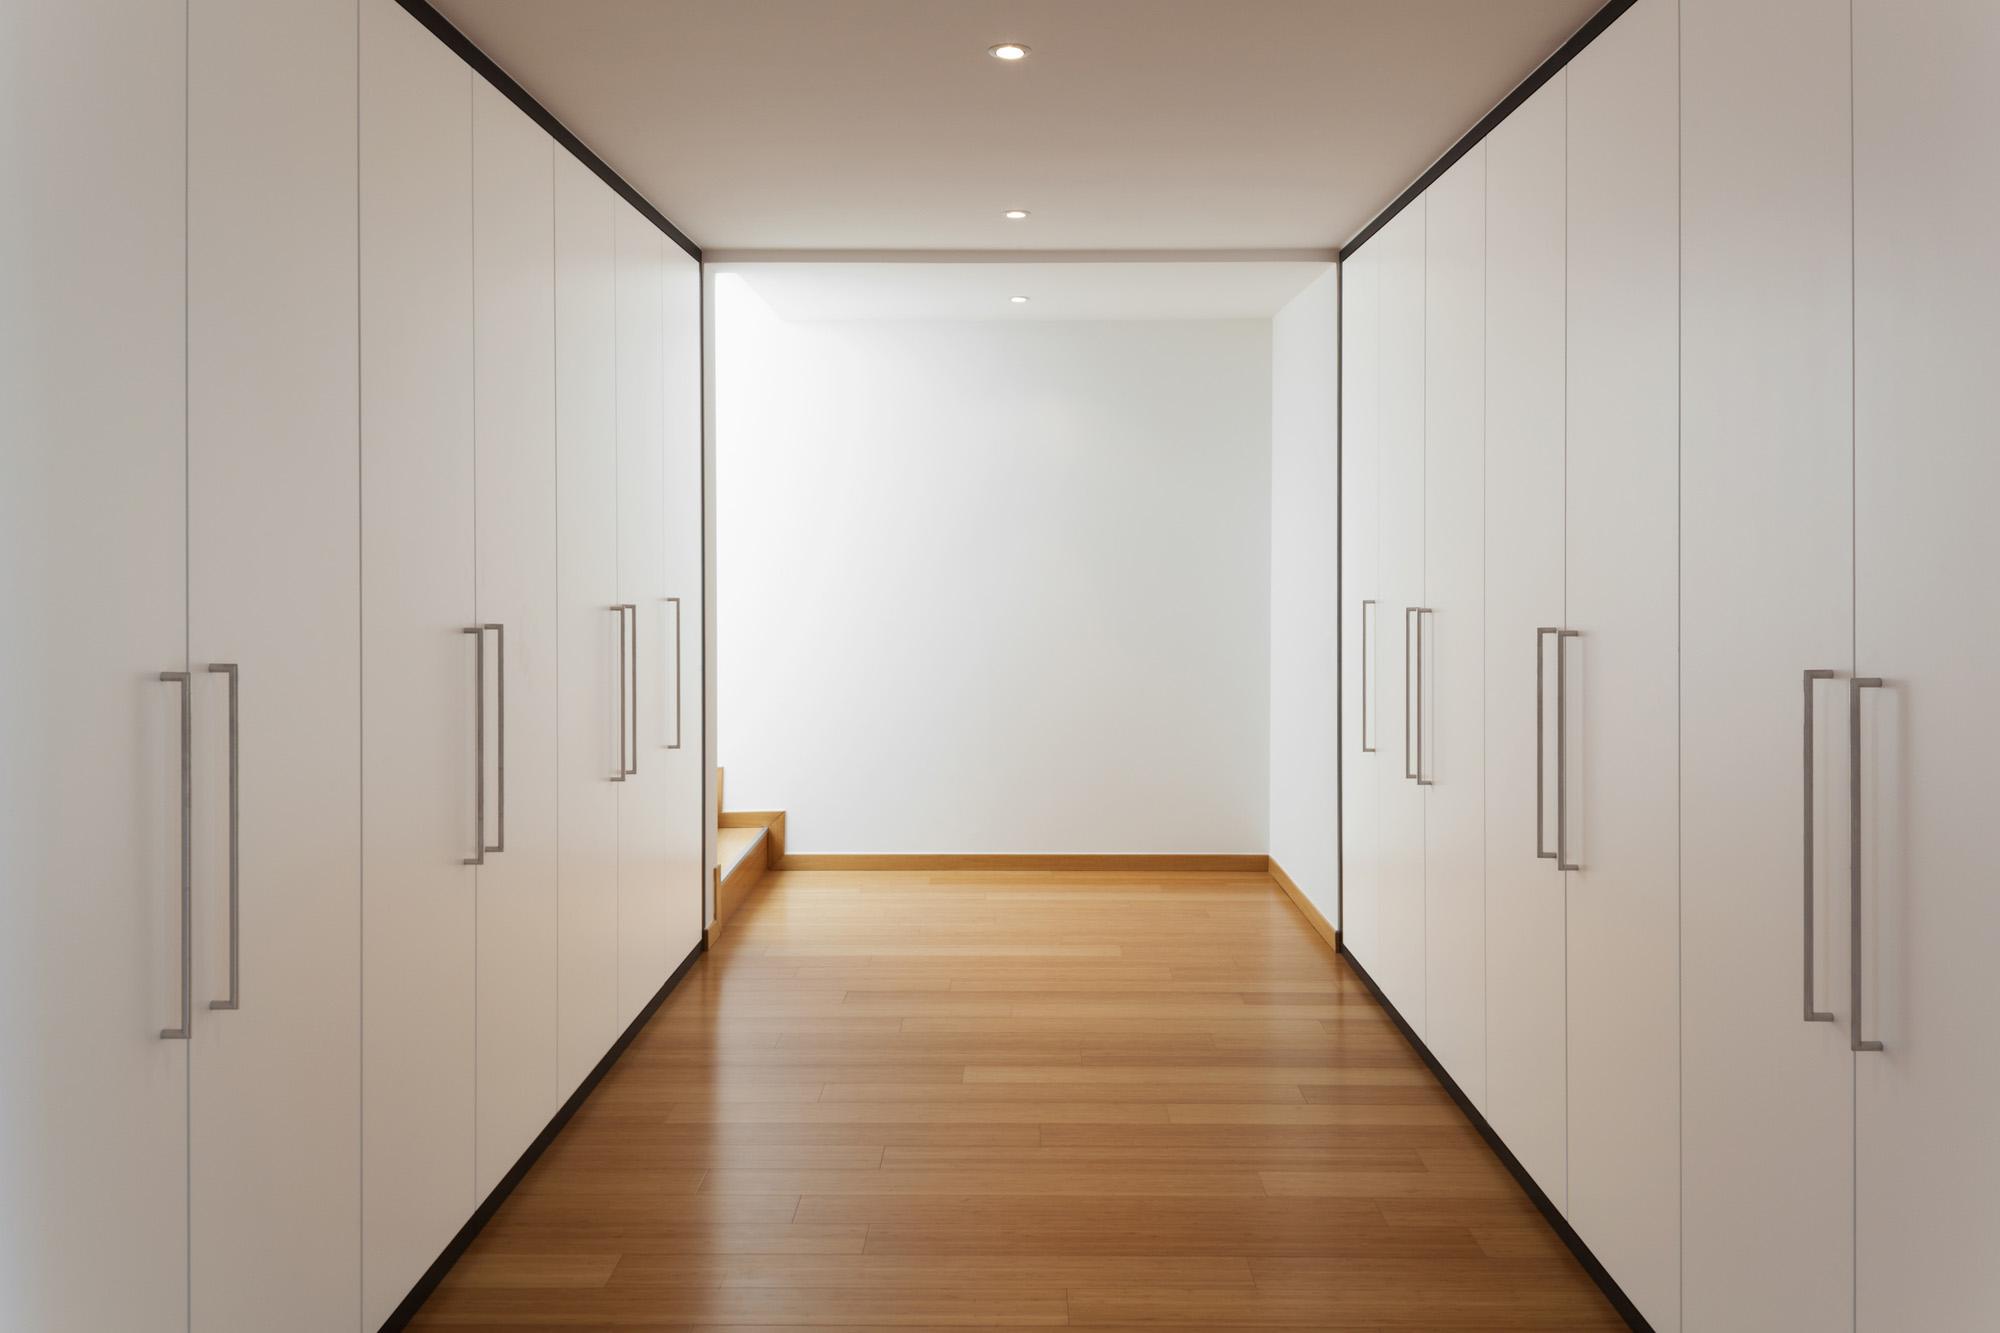 walkin wardrobe, white wardrobe, hinged wardrobe doors, modern wardrobe